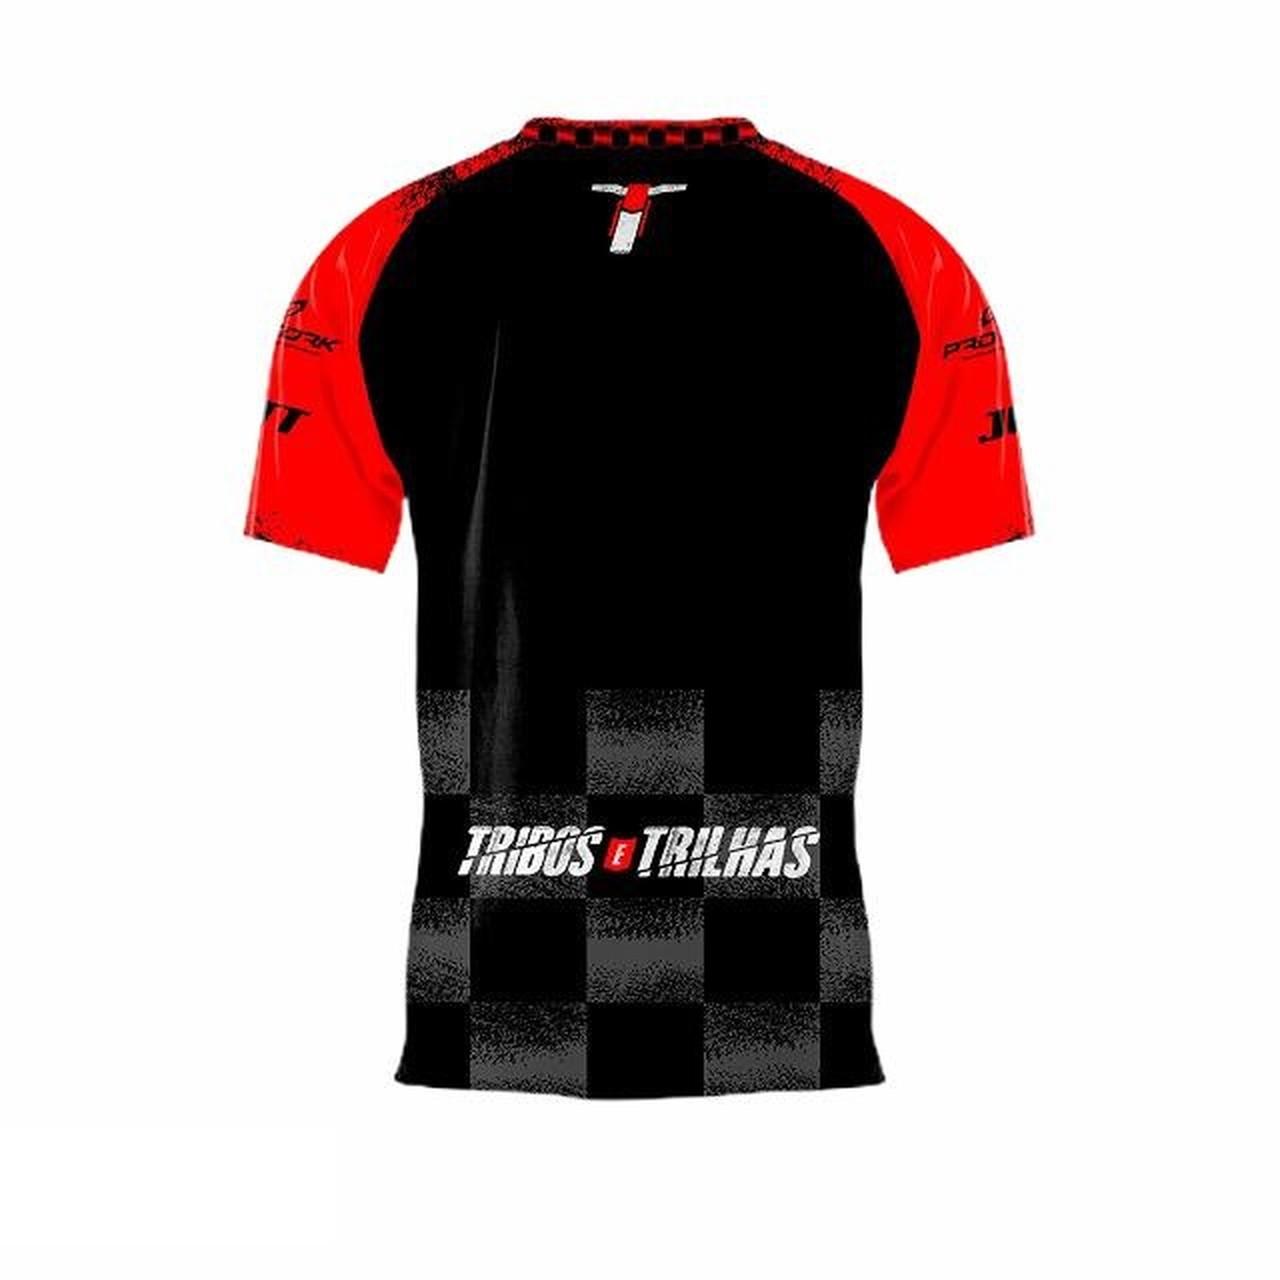 Camiseta Motocross Tribos e Trilhas Manga Curta